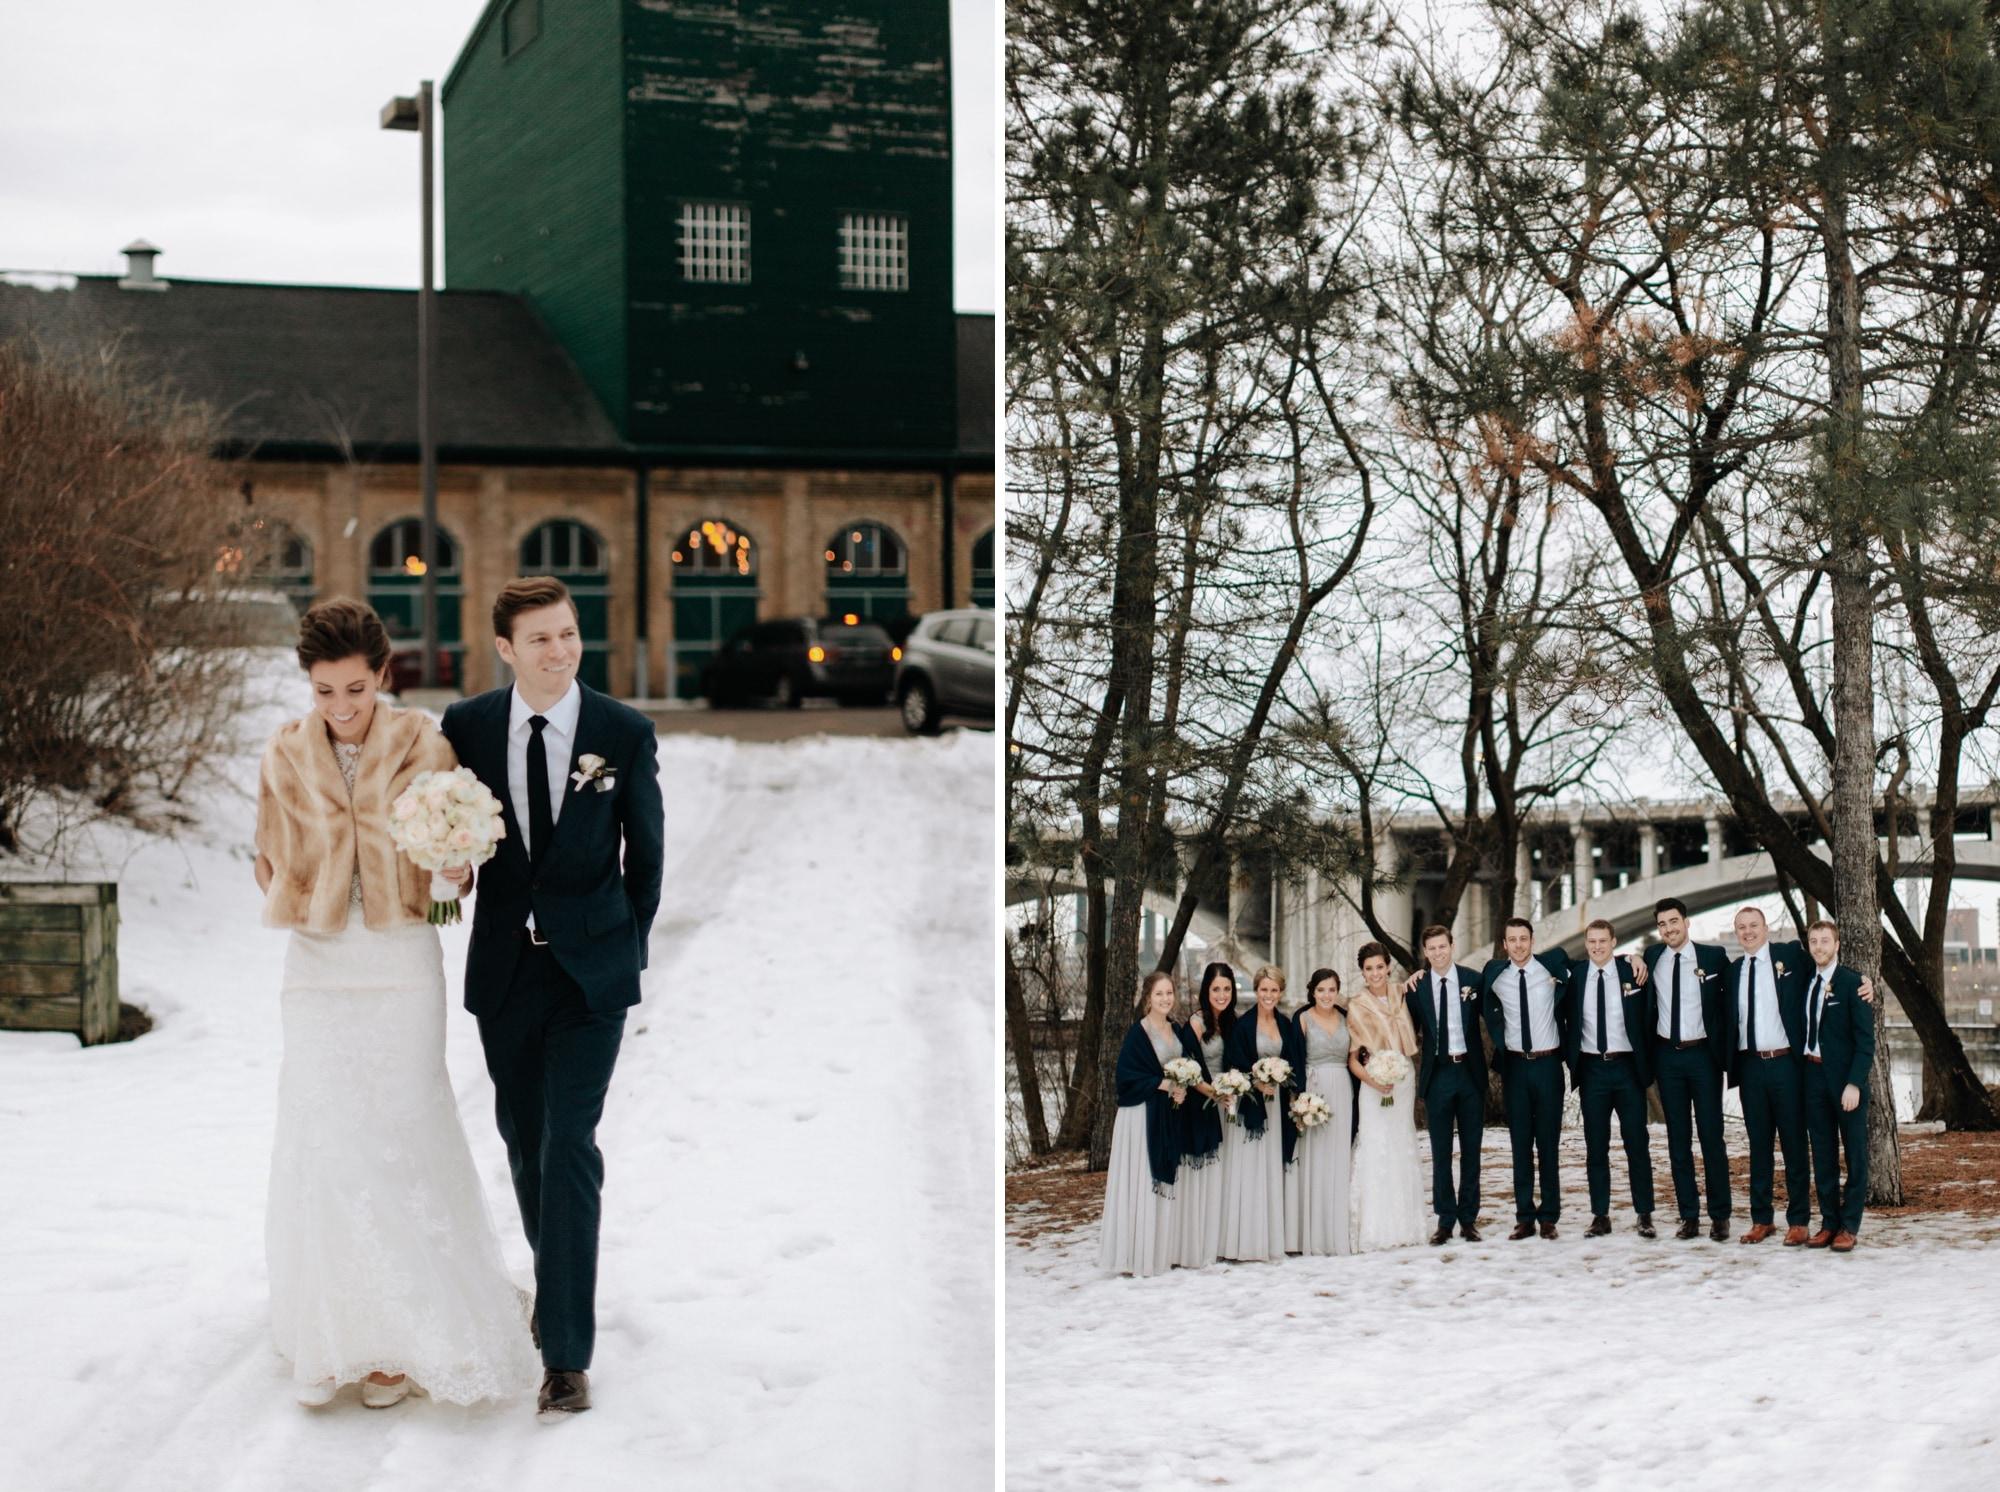 Nicollet-Island-Pavilion-Winter-Wedding-Minneapolis_40.jpg